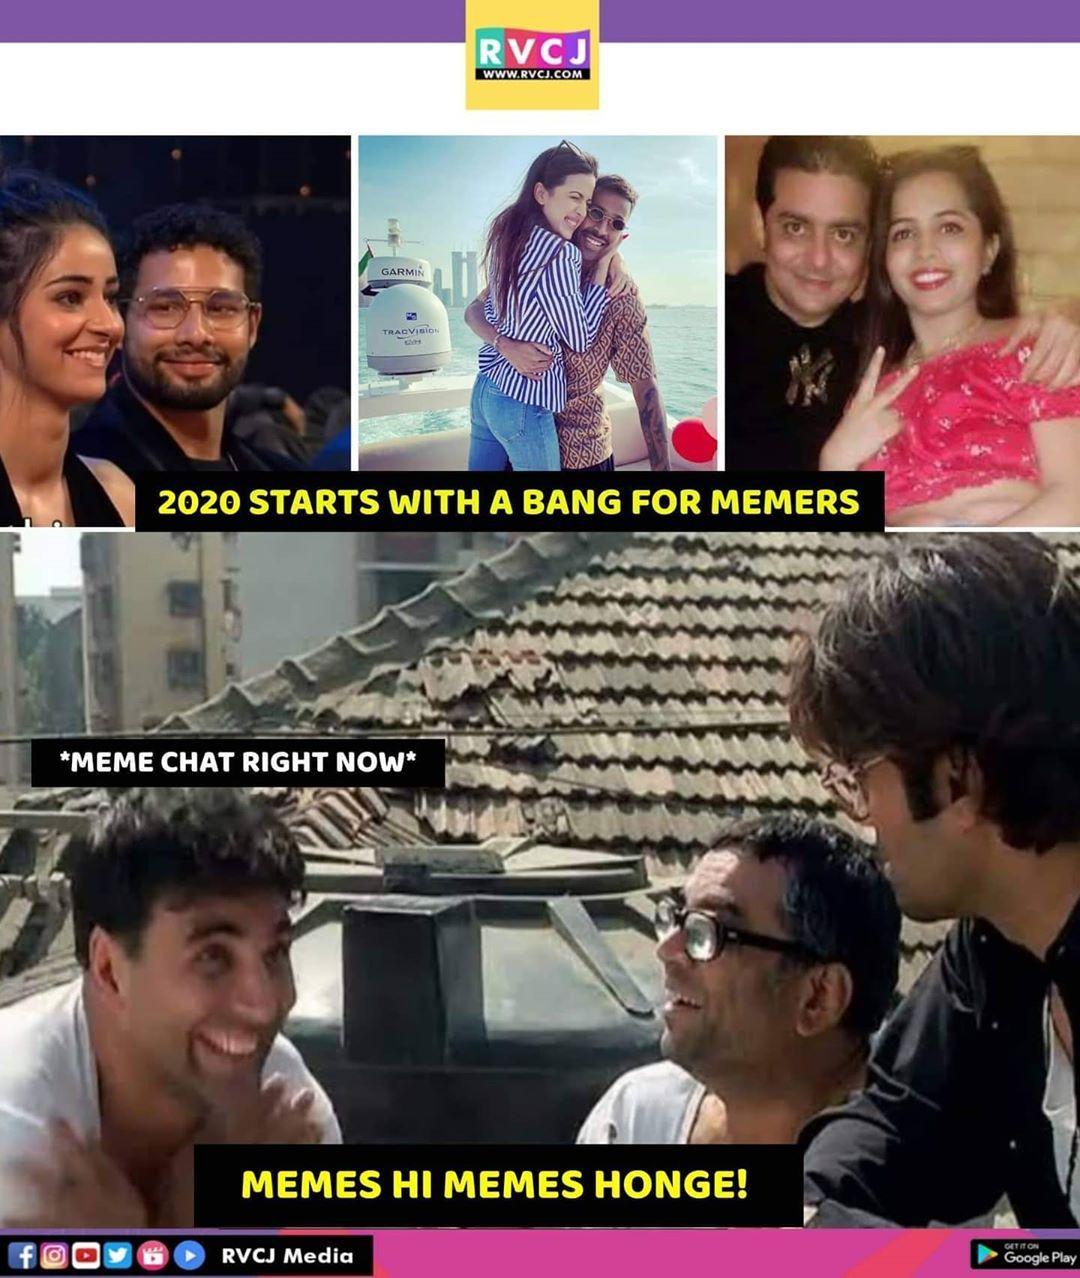 20 7k Likes 50 Comments Rvcj Media Rvcjinsta On Instagram Best Start To A New Year Rvcjinsta Meme Memer Me Bollywood Memes Memes Funny Memes